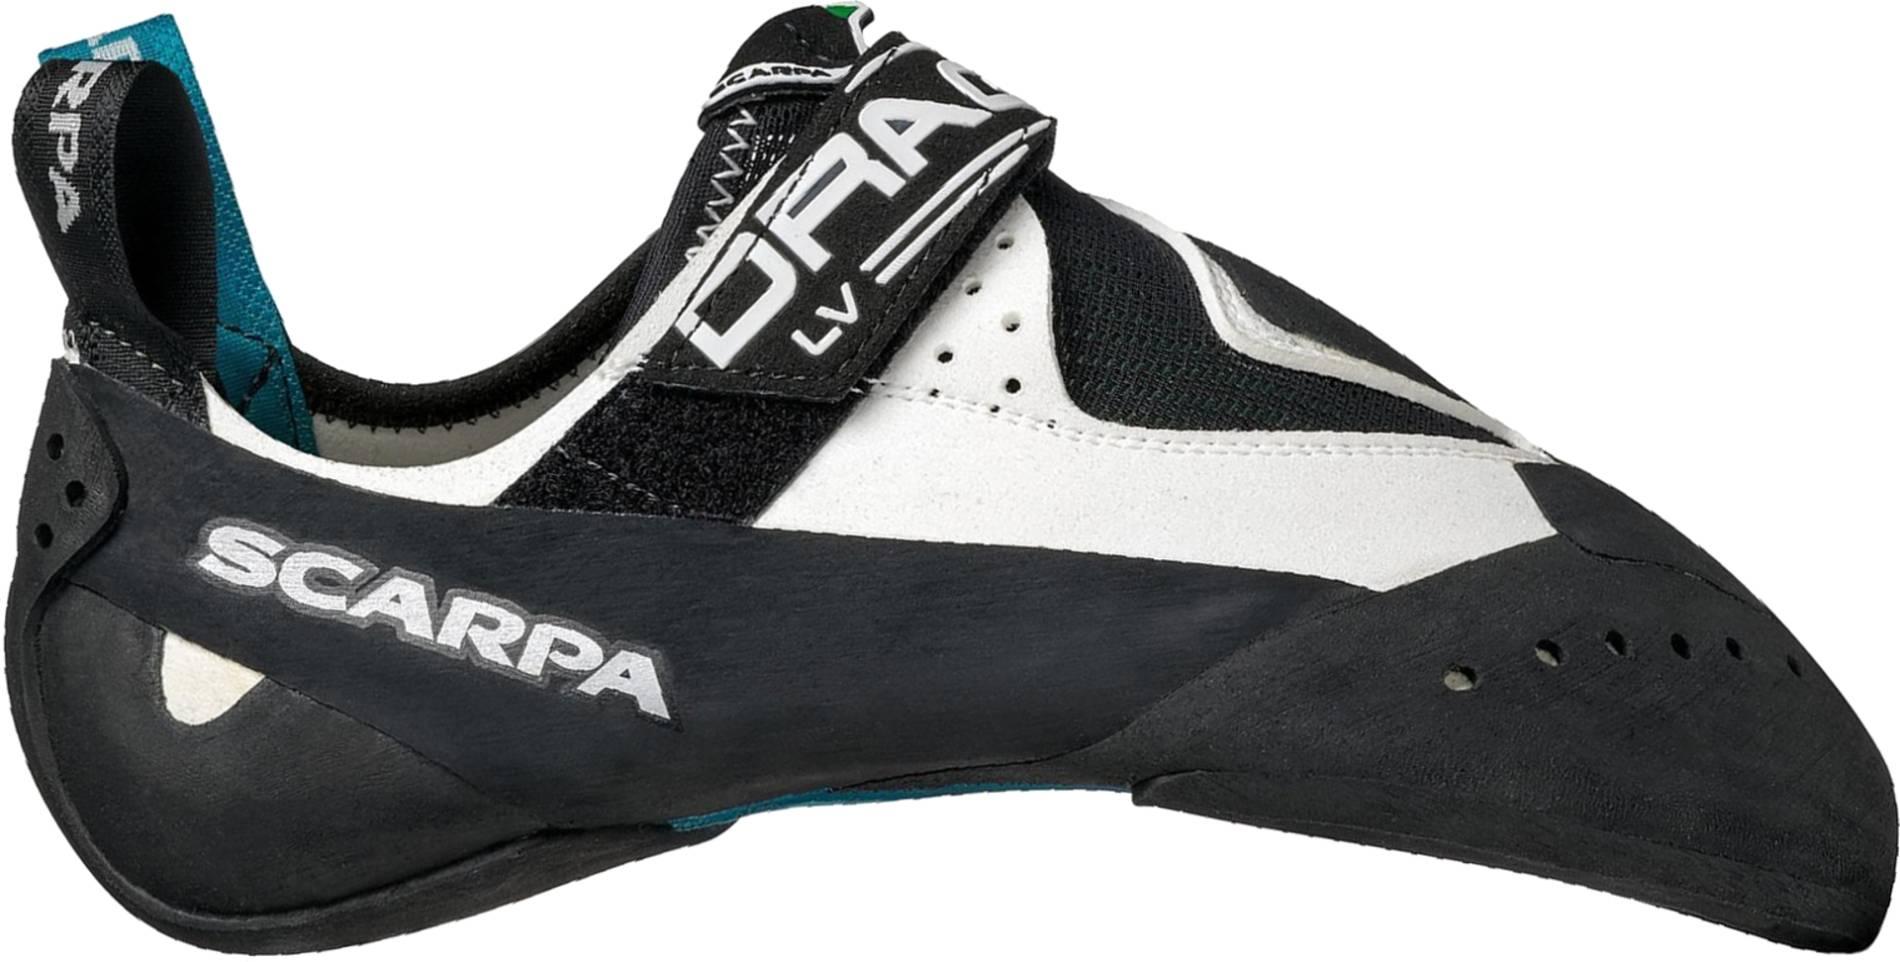 Scarpa Drago LV Climbing Shoe